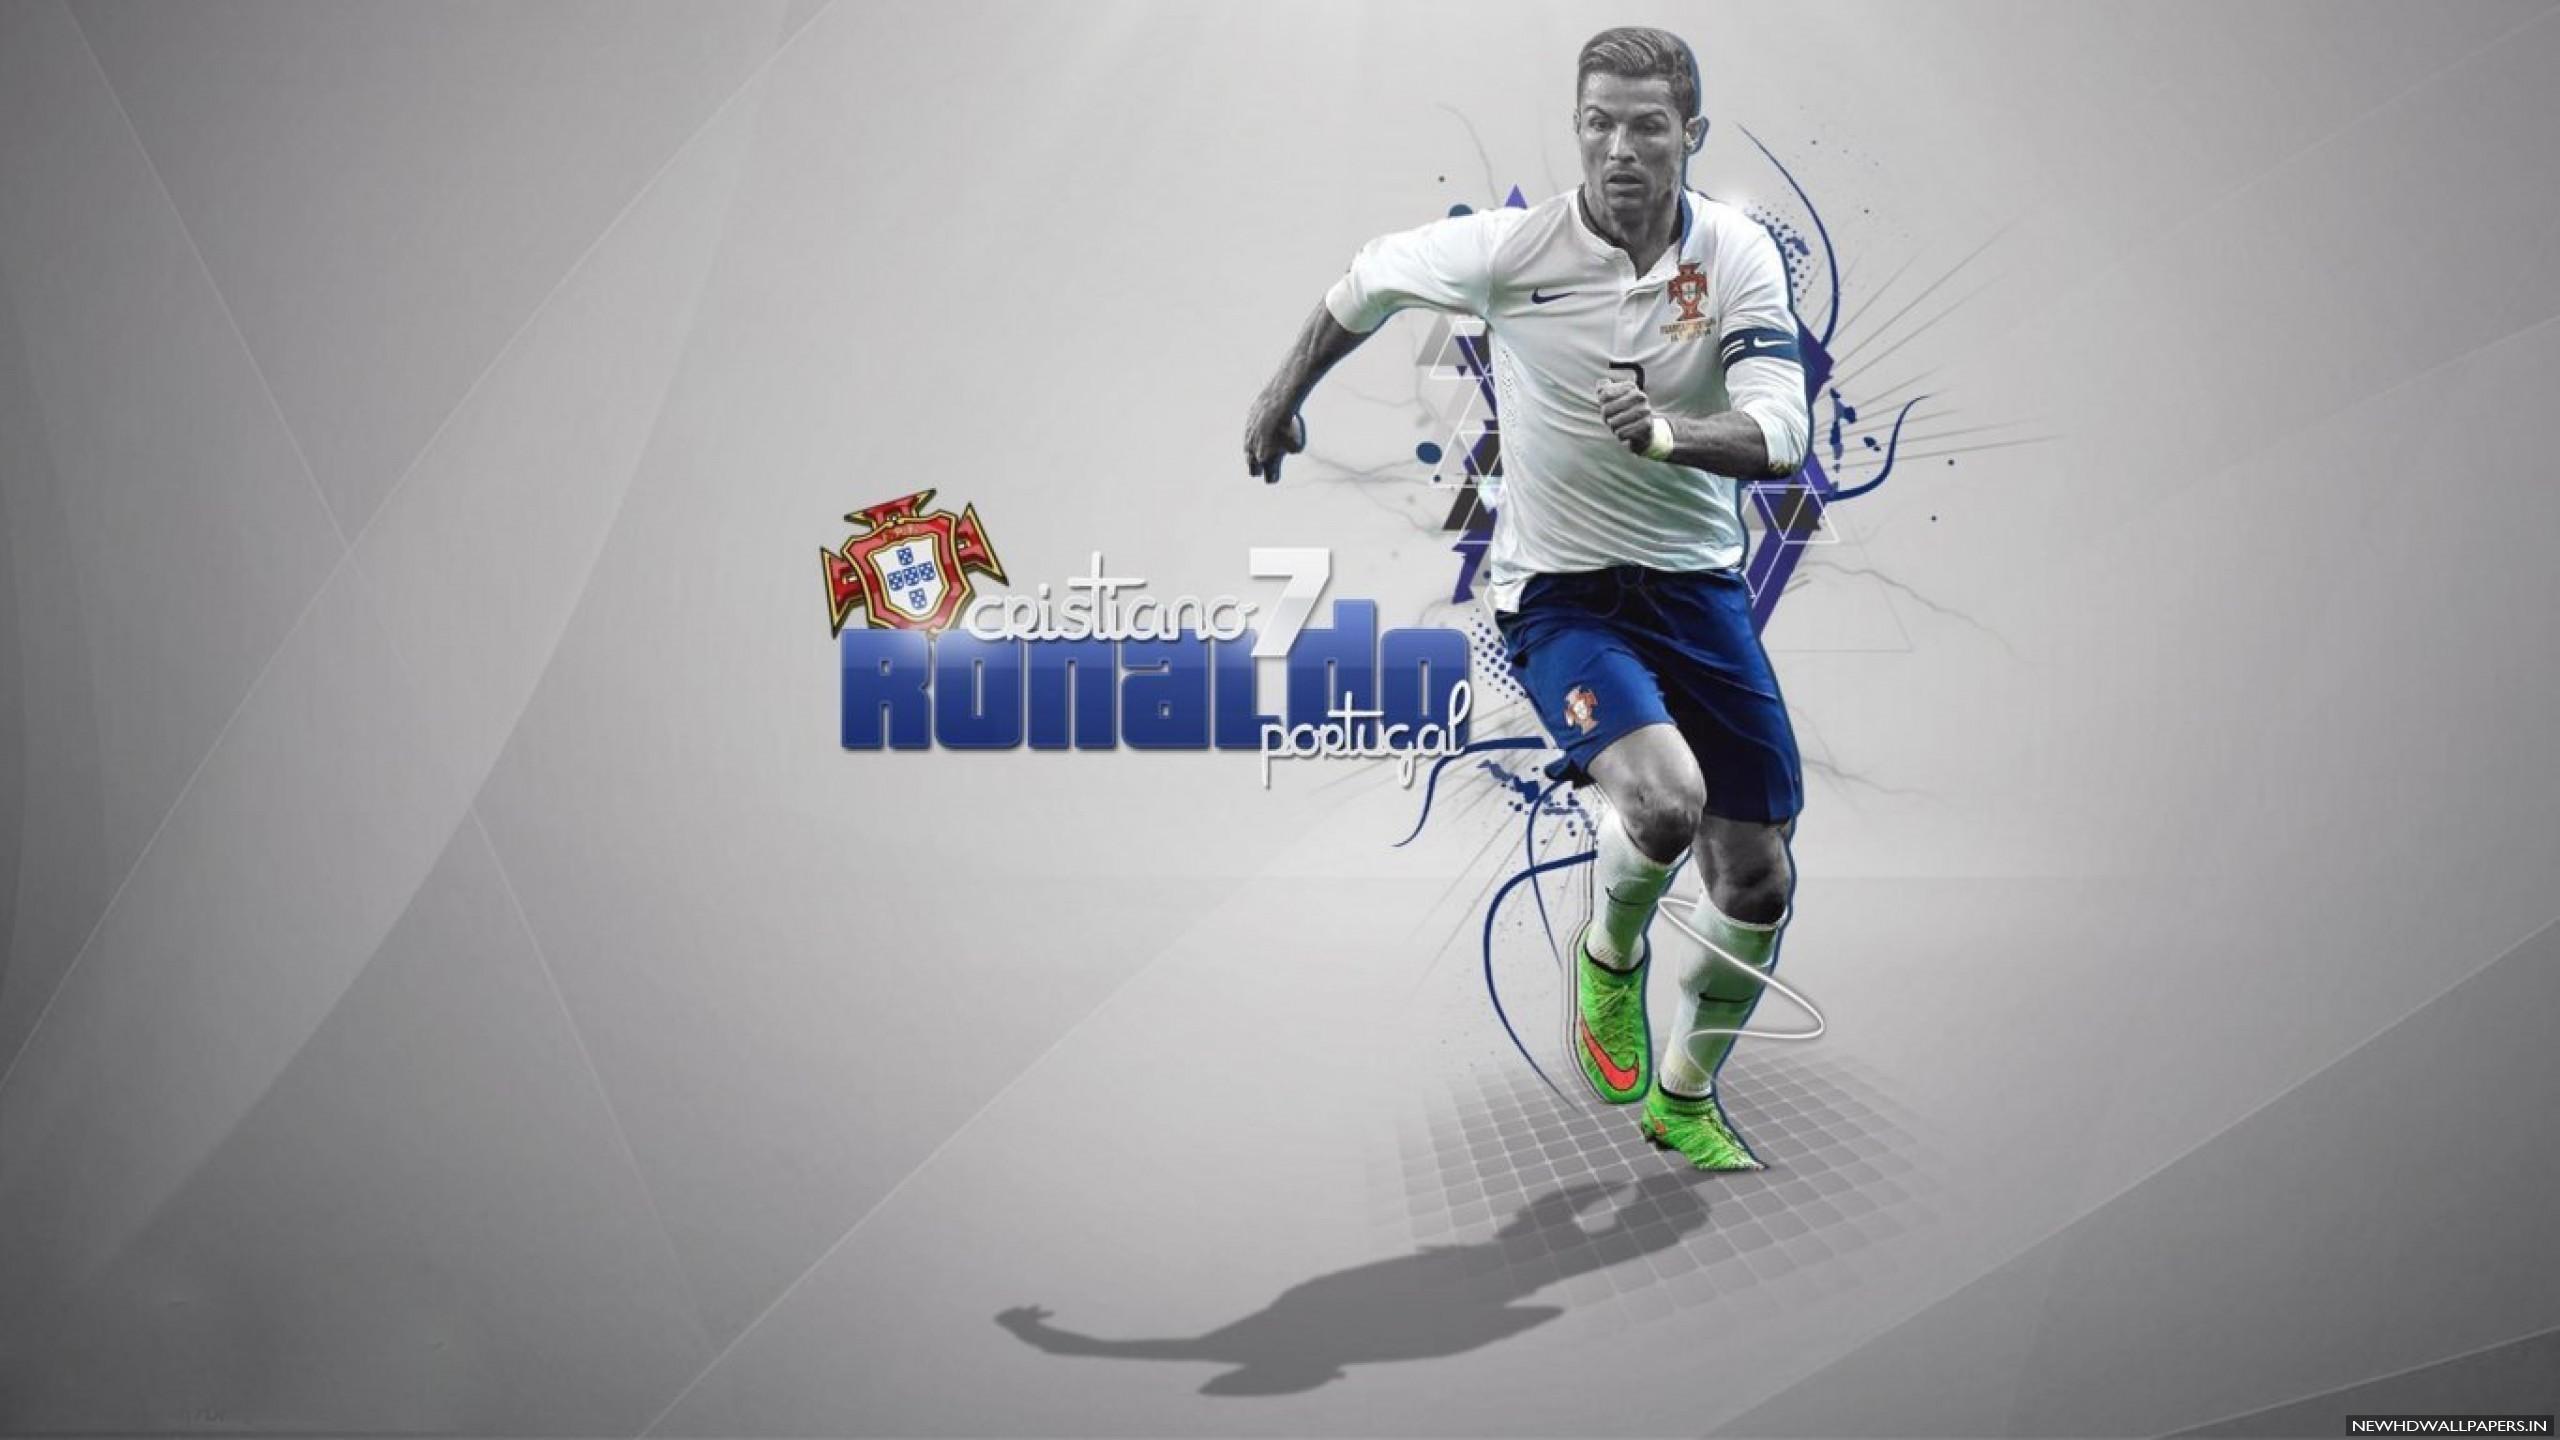 Cristiano Ronaldo 2015 HD Wallpapers – New HD Wallpapers